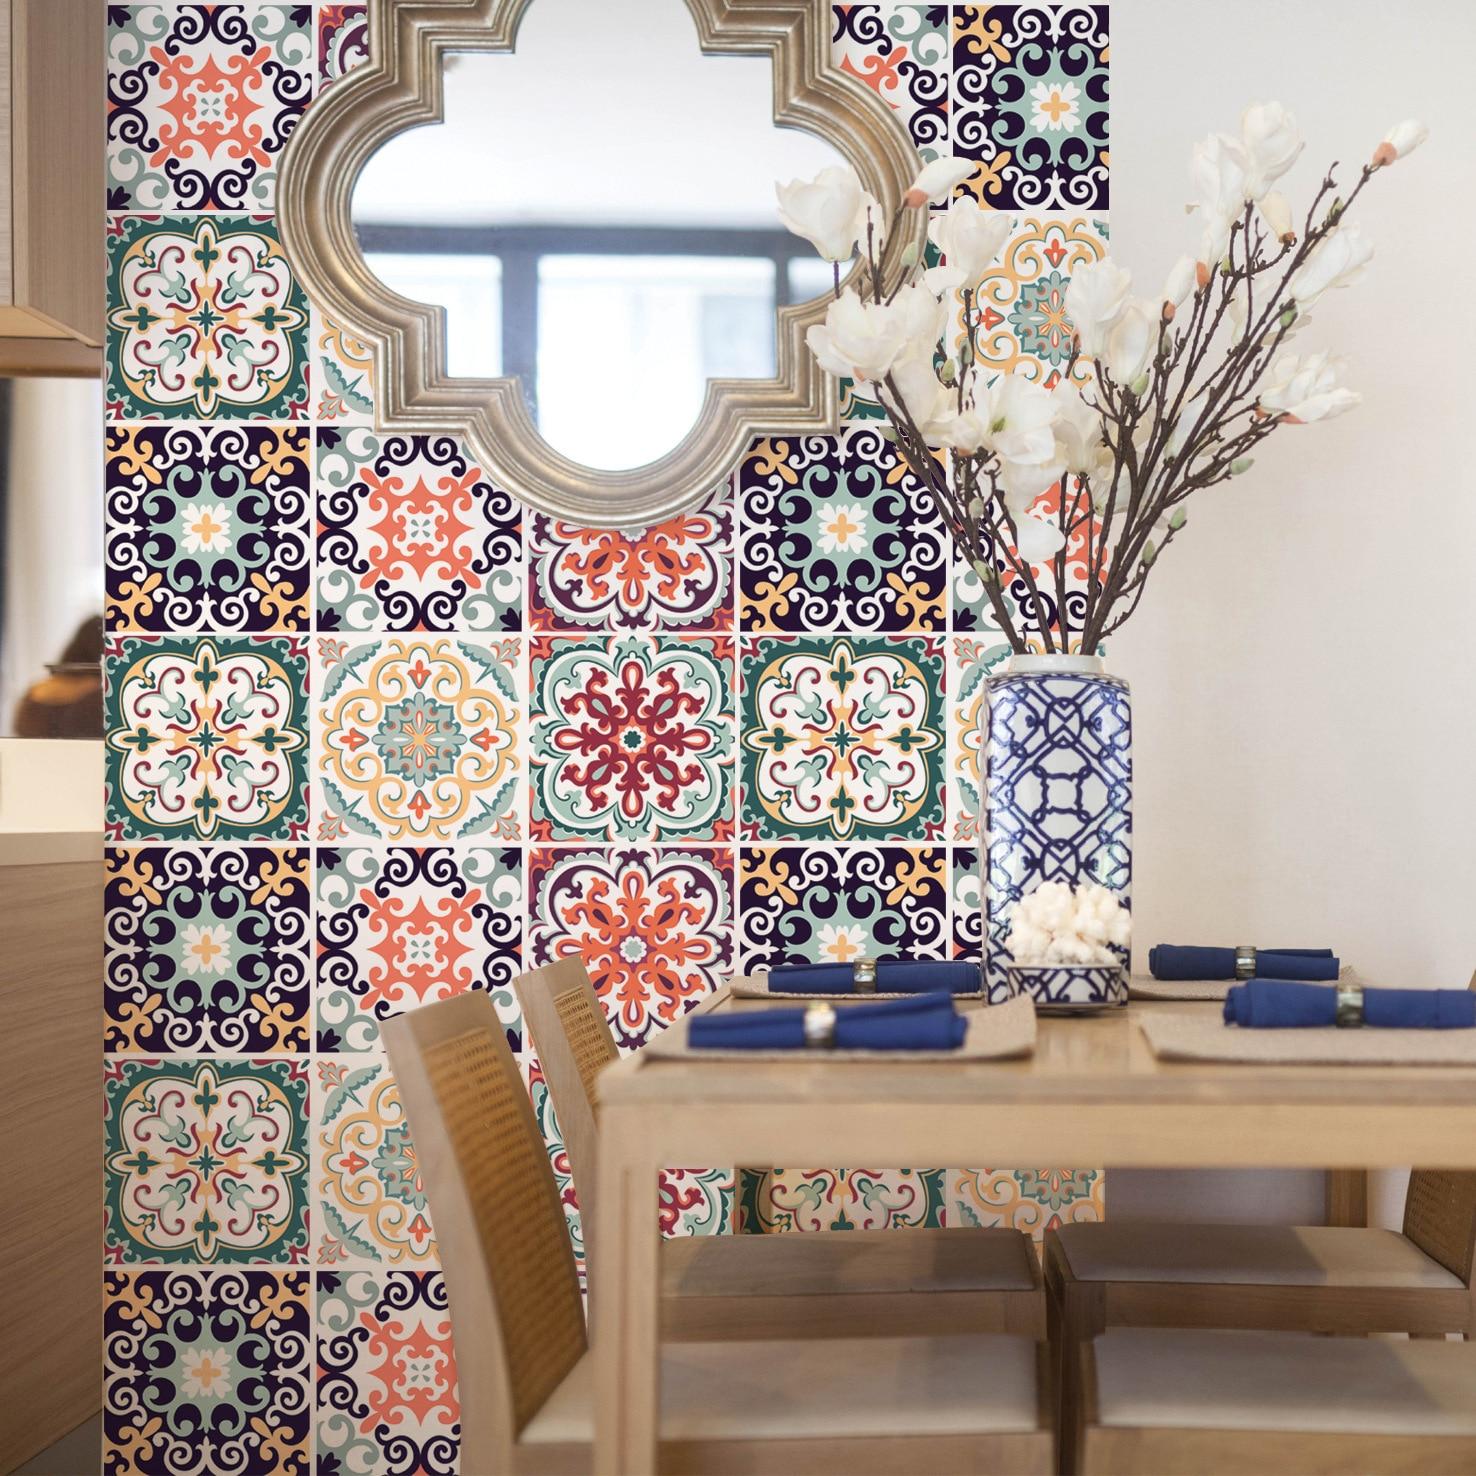 Mediterranean Imitation Ceramic Tile Paste Bathroom Kitchen Antiskid Wall Paste DIY Creative Stitching FX707 Self Adhesive